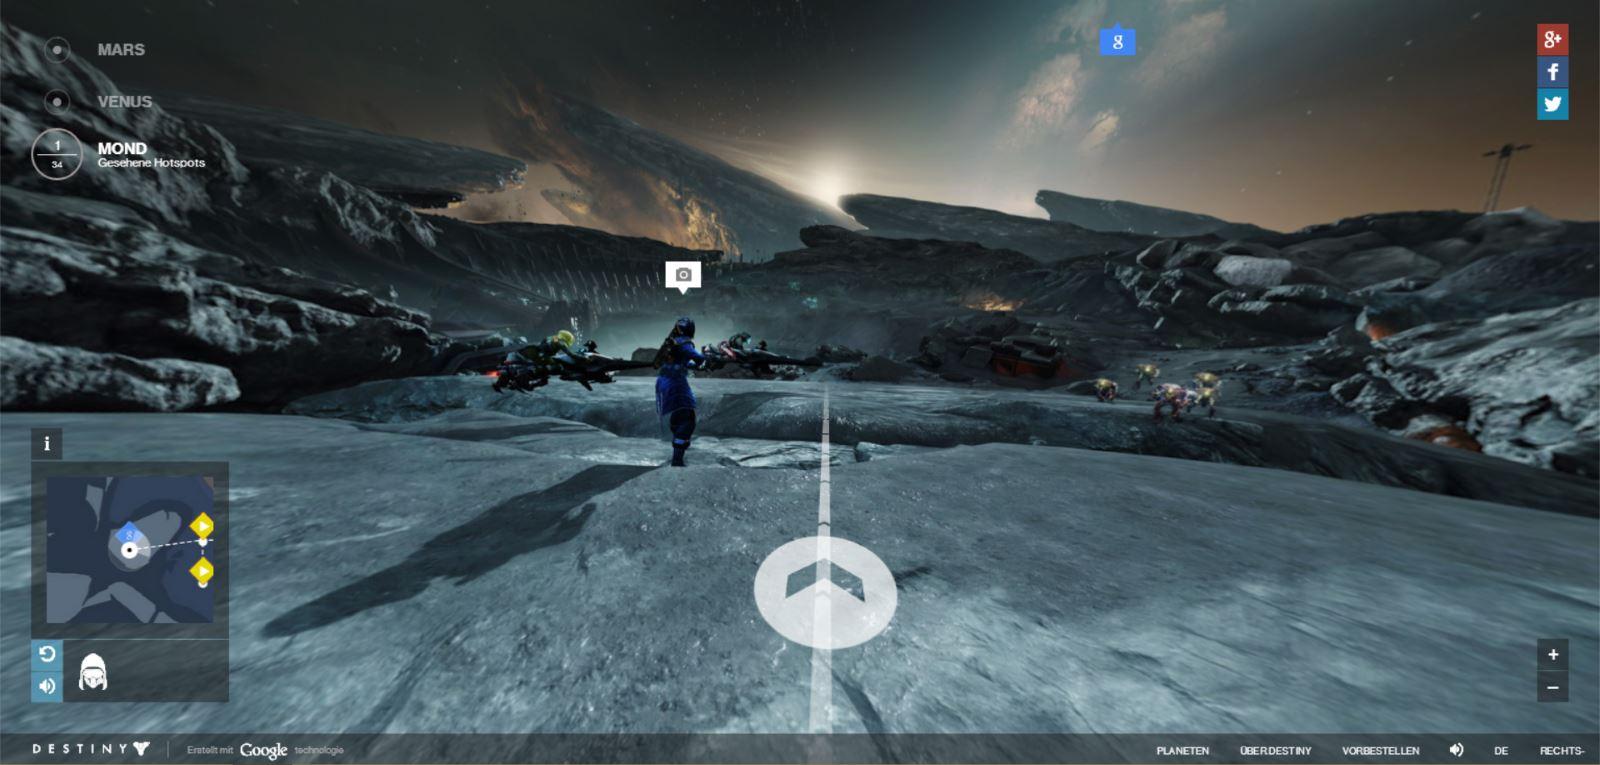 Destiny mit PR-Coup: Mond-Spaziergang dank Google Maps